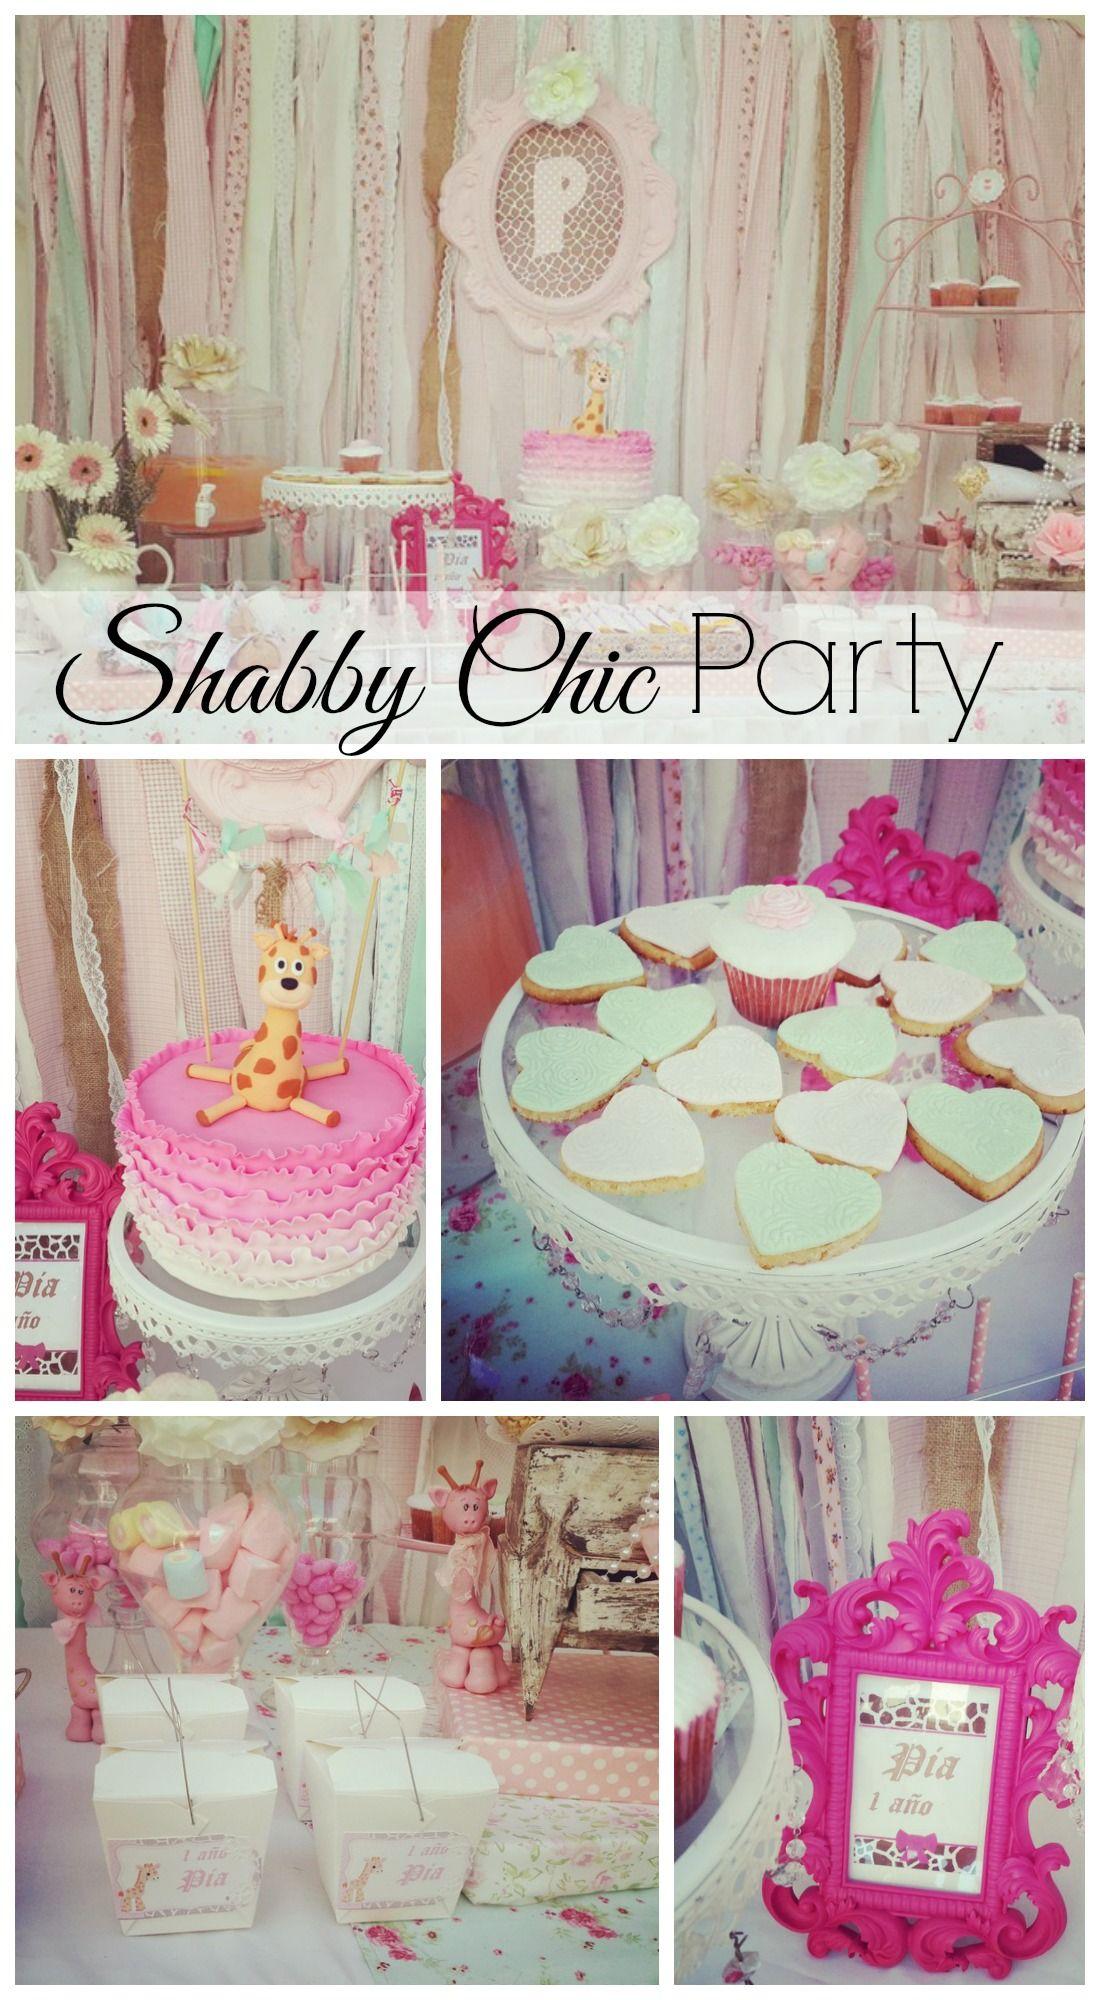 Shabby Chic Birthday Shabby Chic Party Shabby Chic Party Ideas